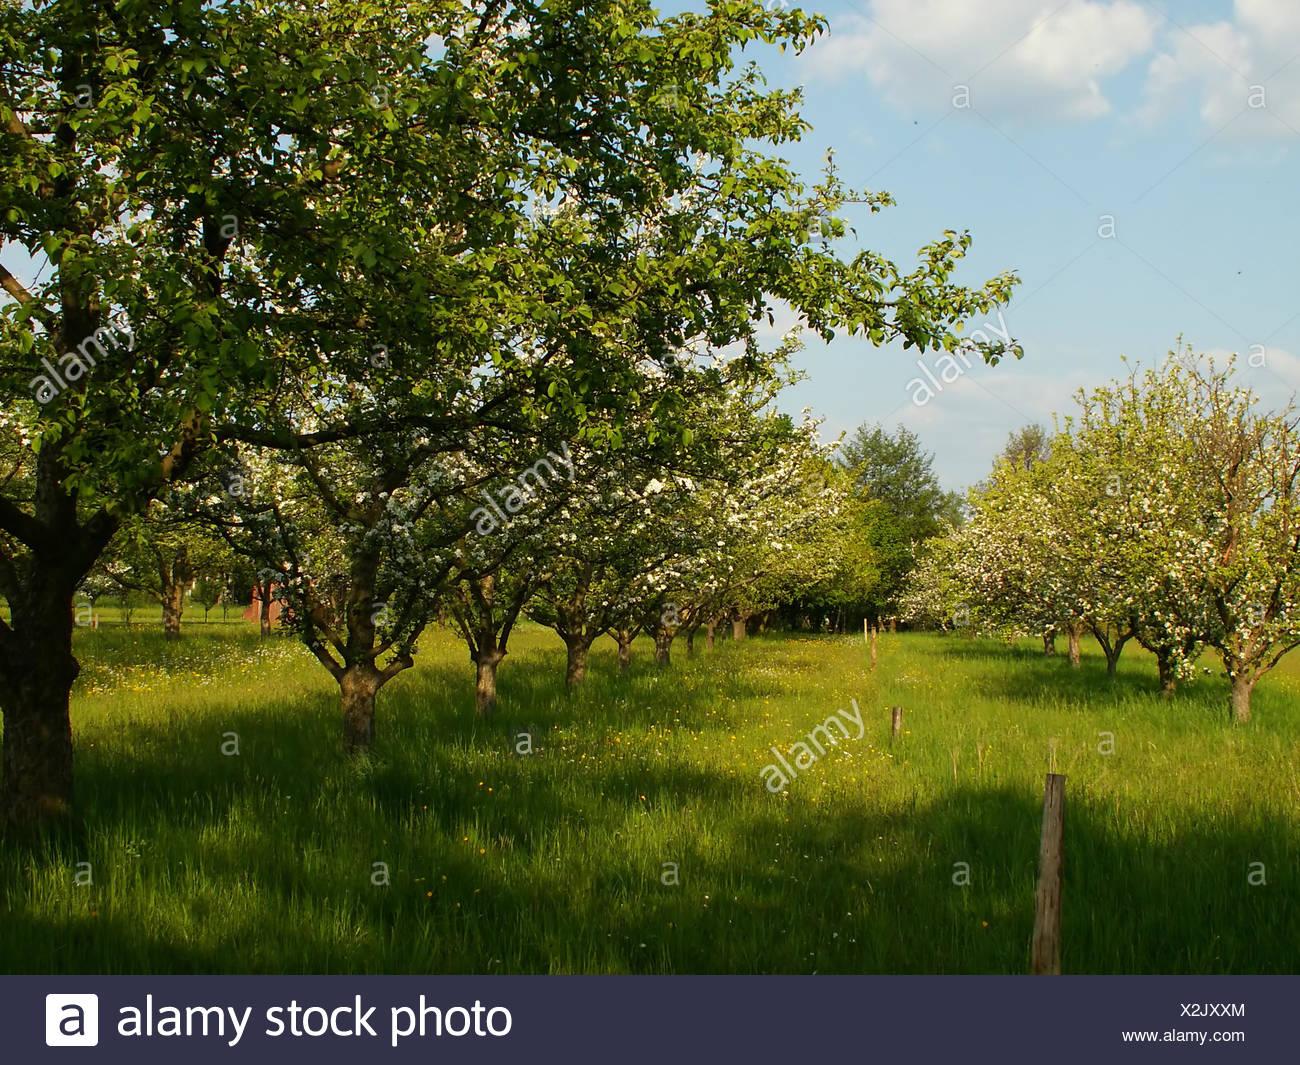 Eco Garden Bloom Blossom Flourish Flourishing Fruit Apples Apple